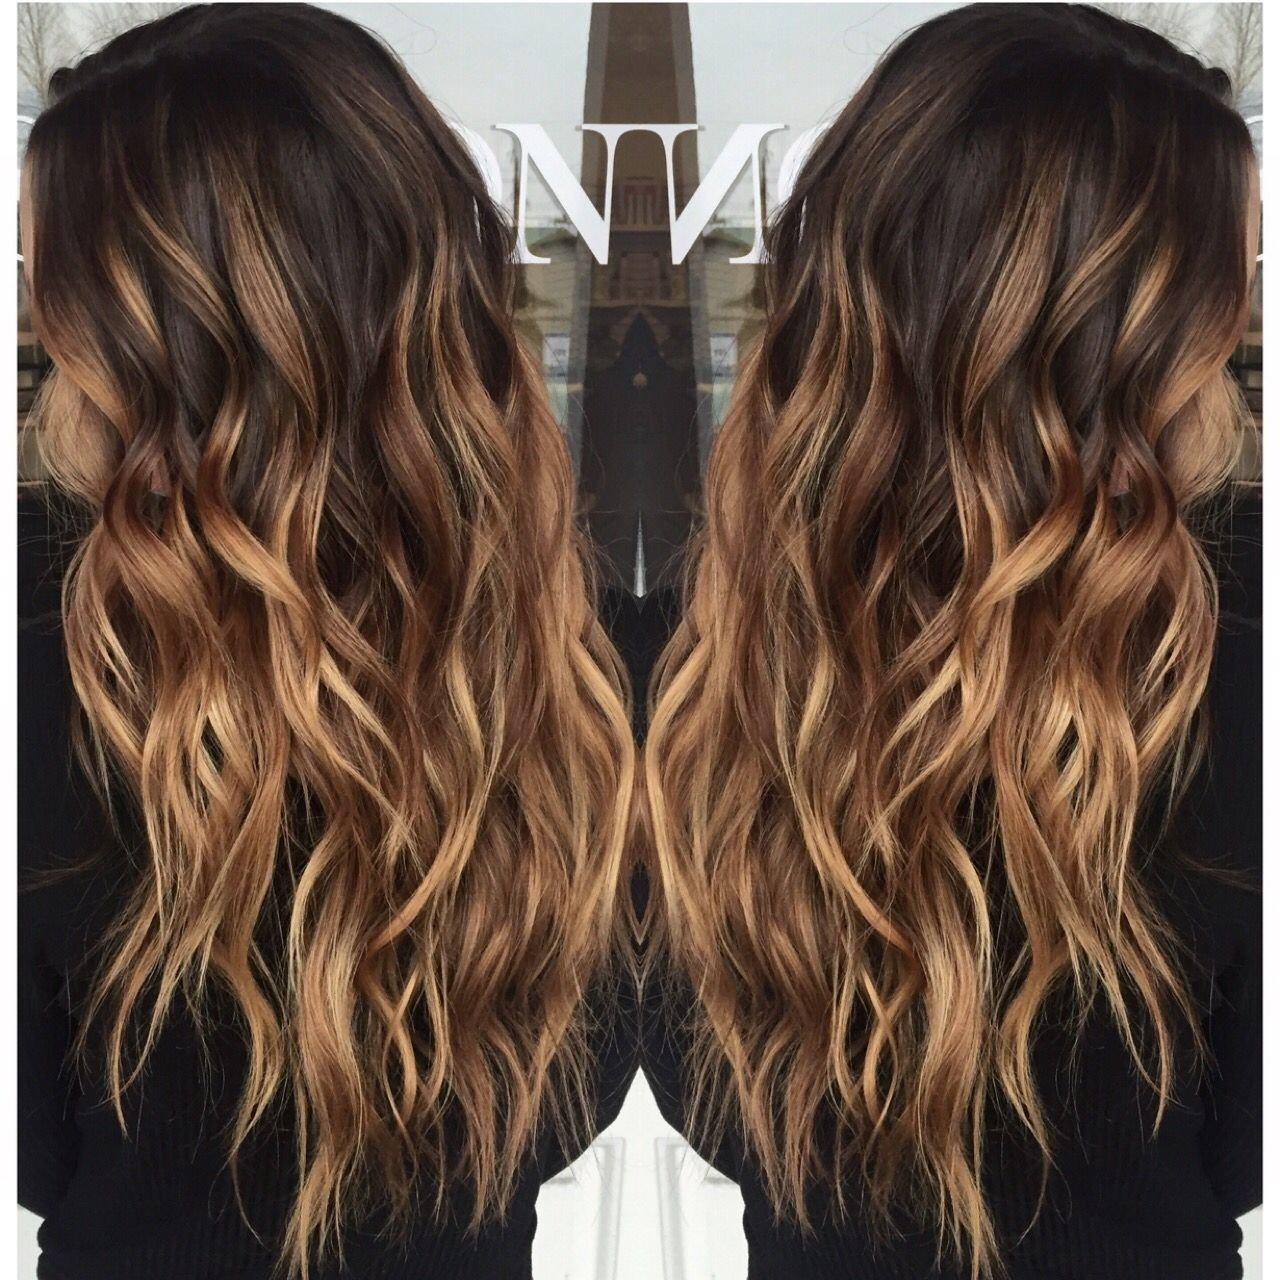 10 Stunning Hair Highlight Ideas For Brown Hair carmel balayage pinteres 2020